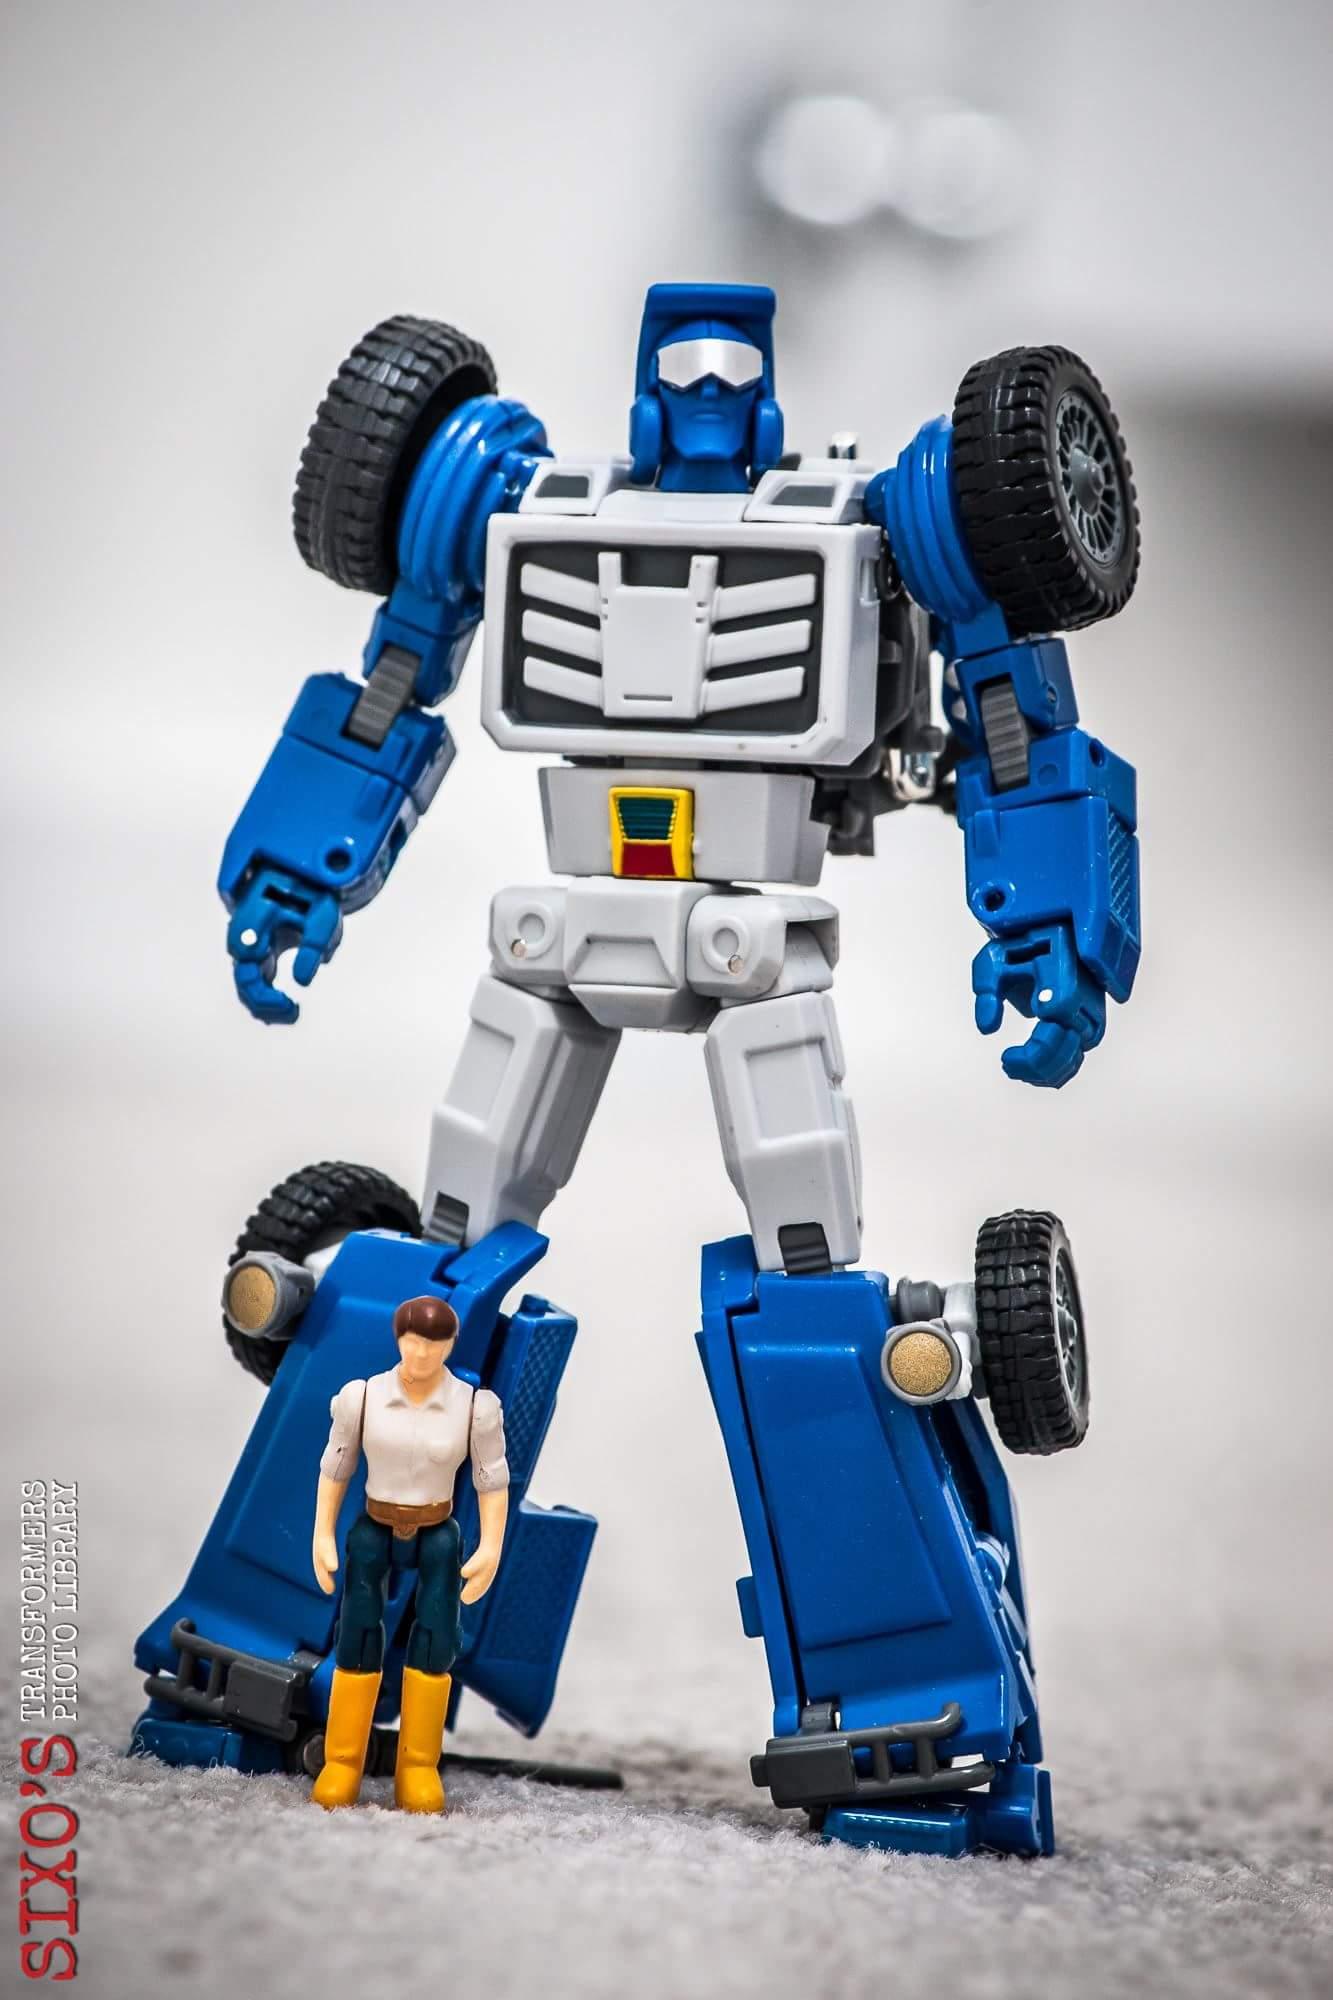 [X-Transbots] Produit Tiers - Minibots MP - Gamme MM - Page 6 WWEk8Ulp